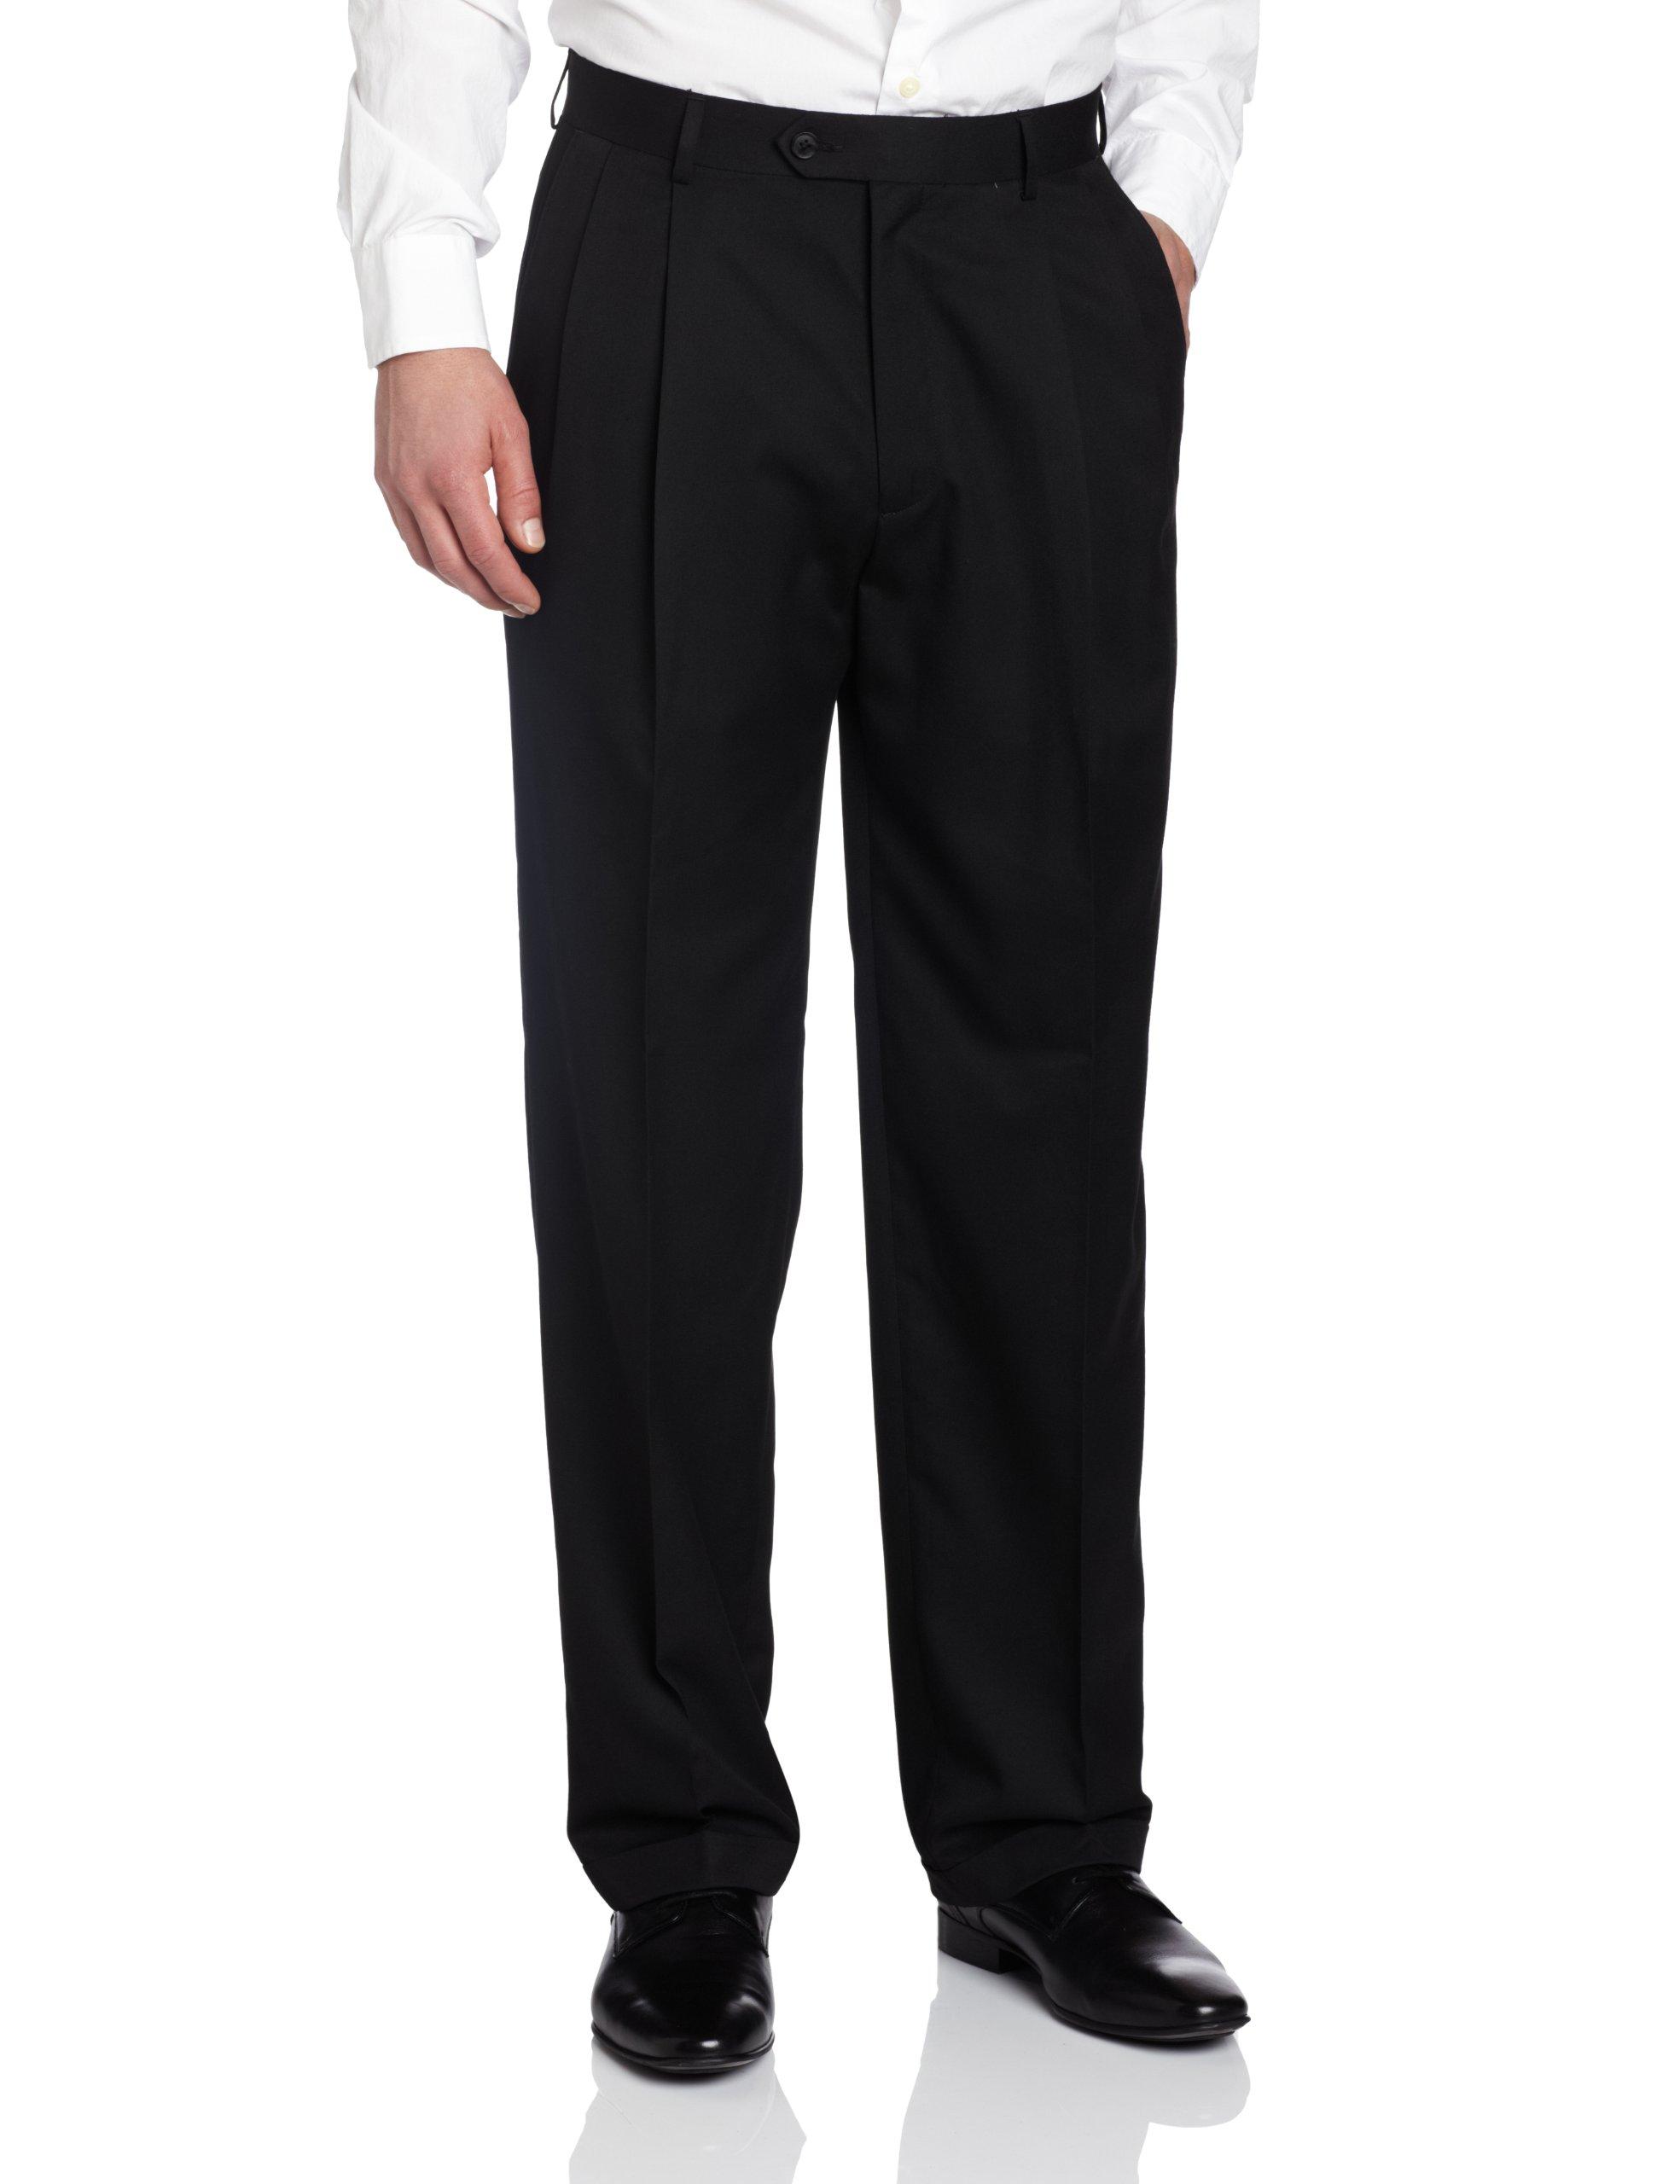 Haggar Men's Solid Pleat Front Suit Separate Pant, Black, 38x29